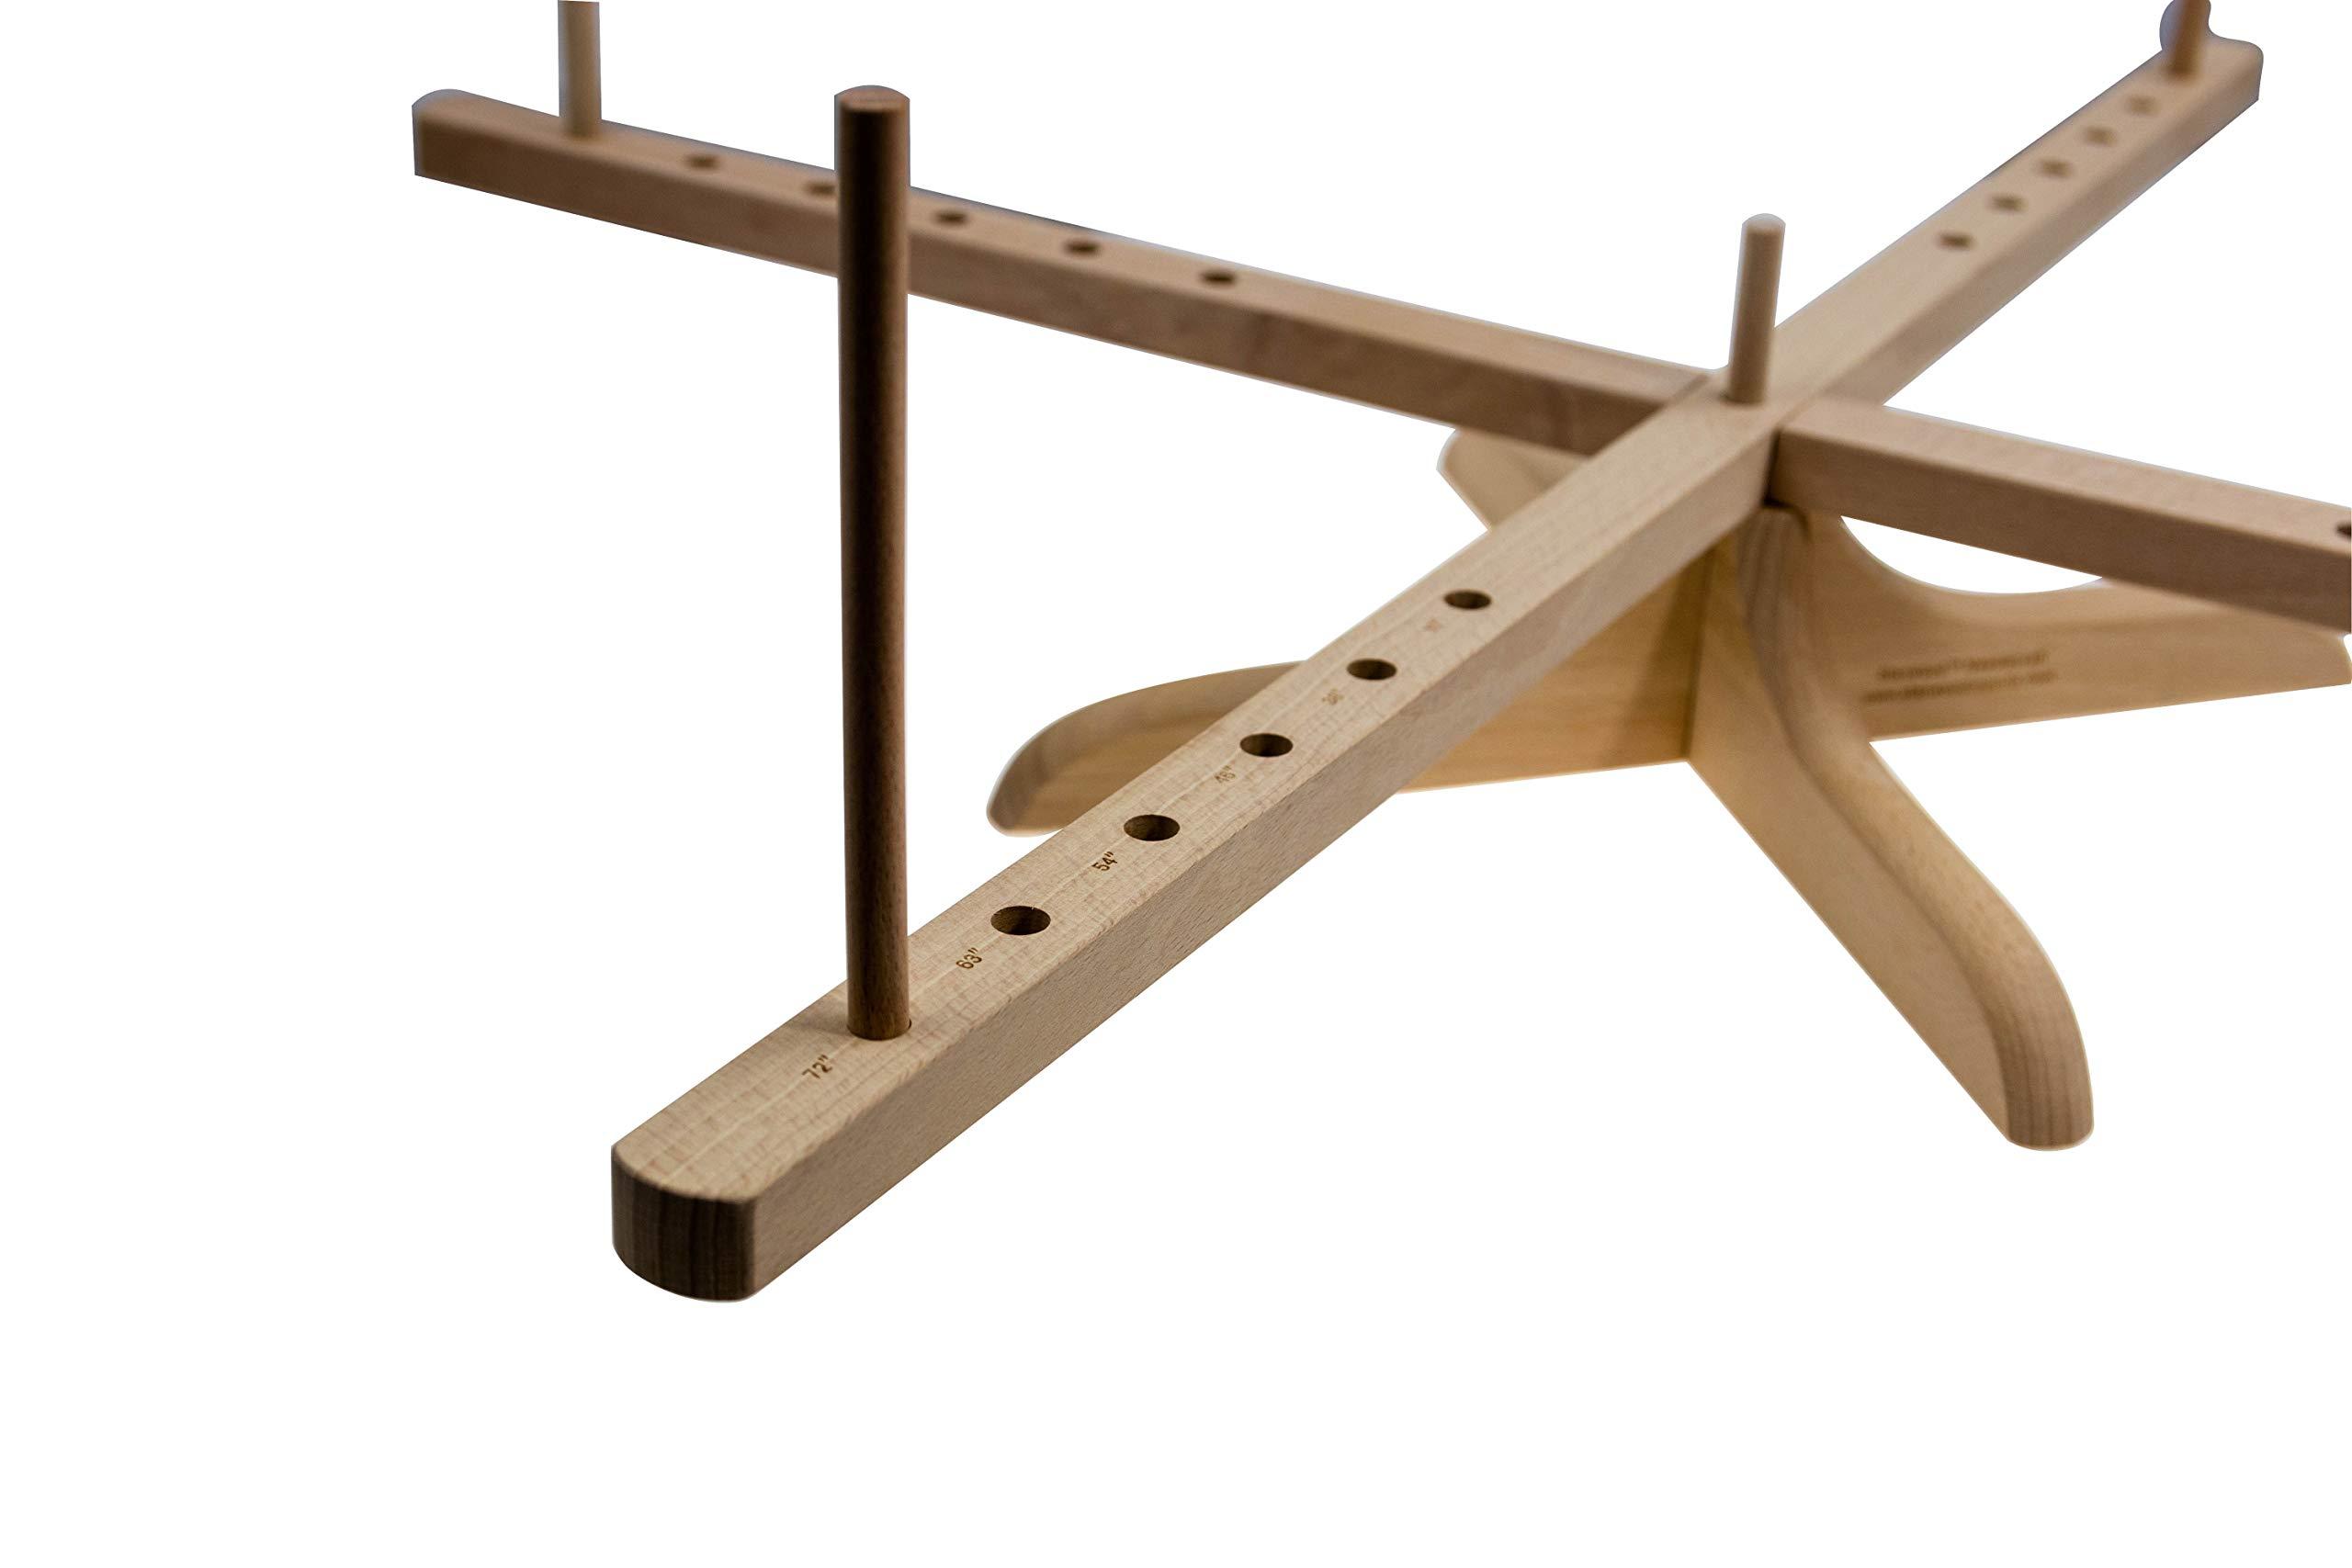 Stanwood Needlecraft Tabletop Amish Style Wooden Yarn Swift, 2.5-6-Feet (YW-3) by Stanwood Needlecraft (Image #3)